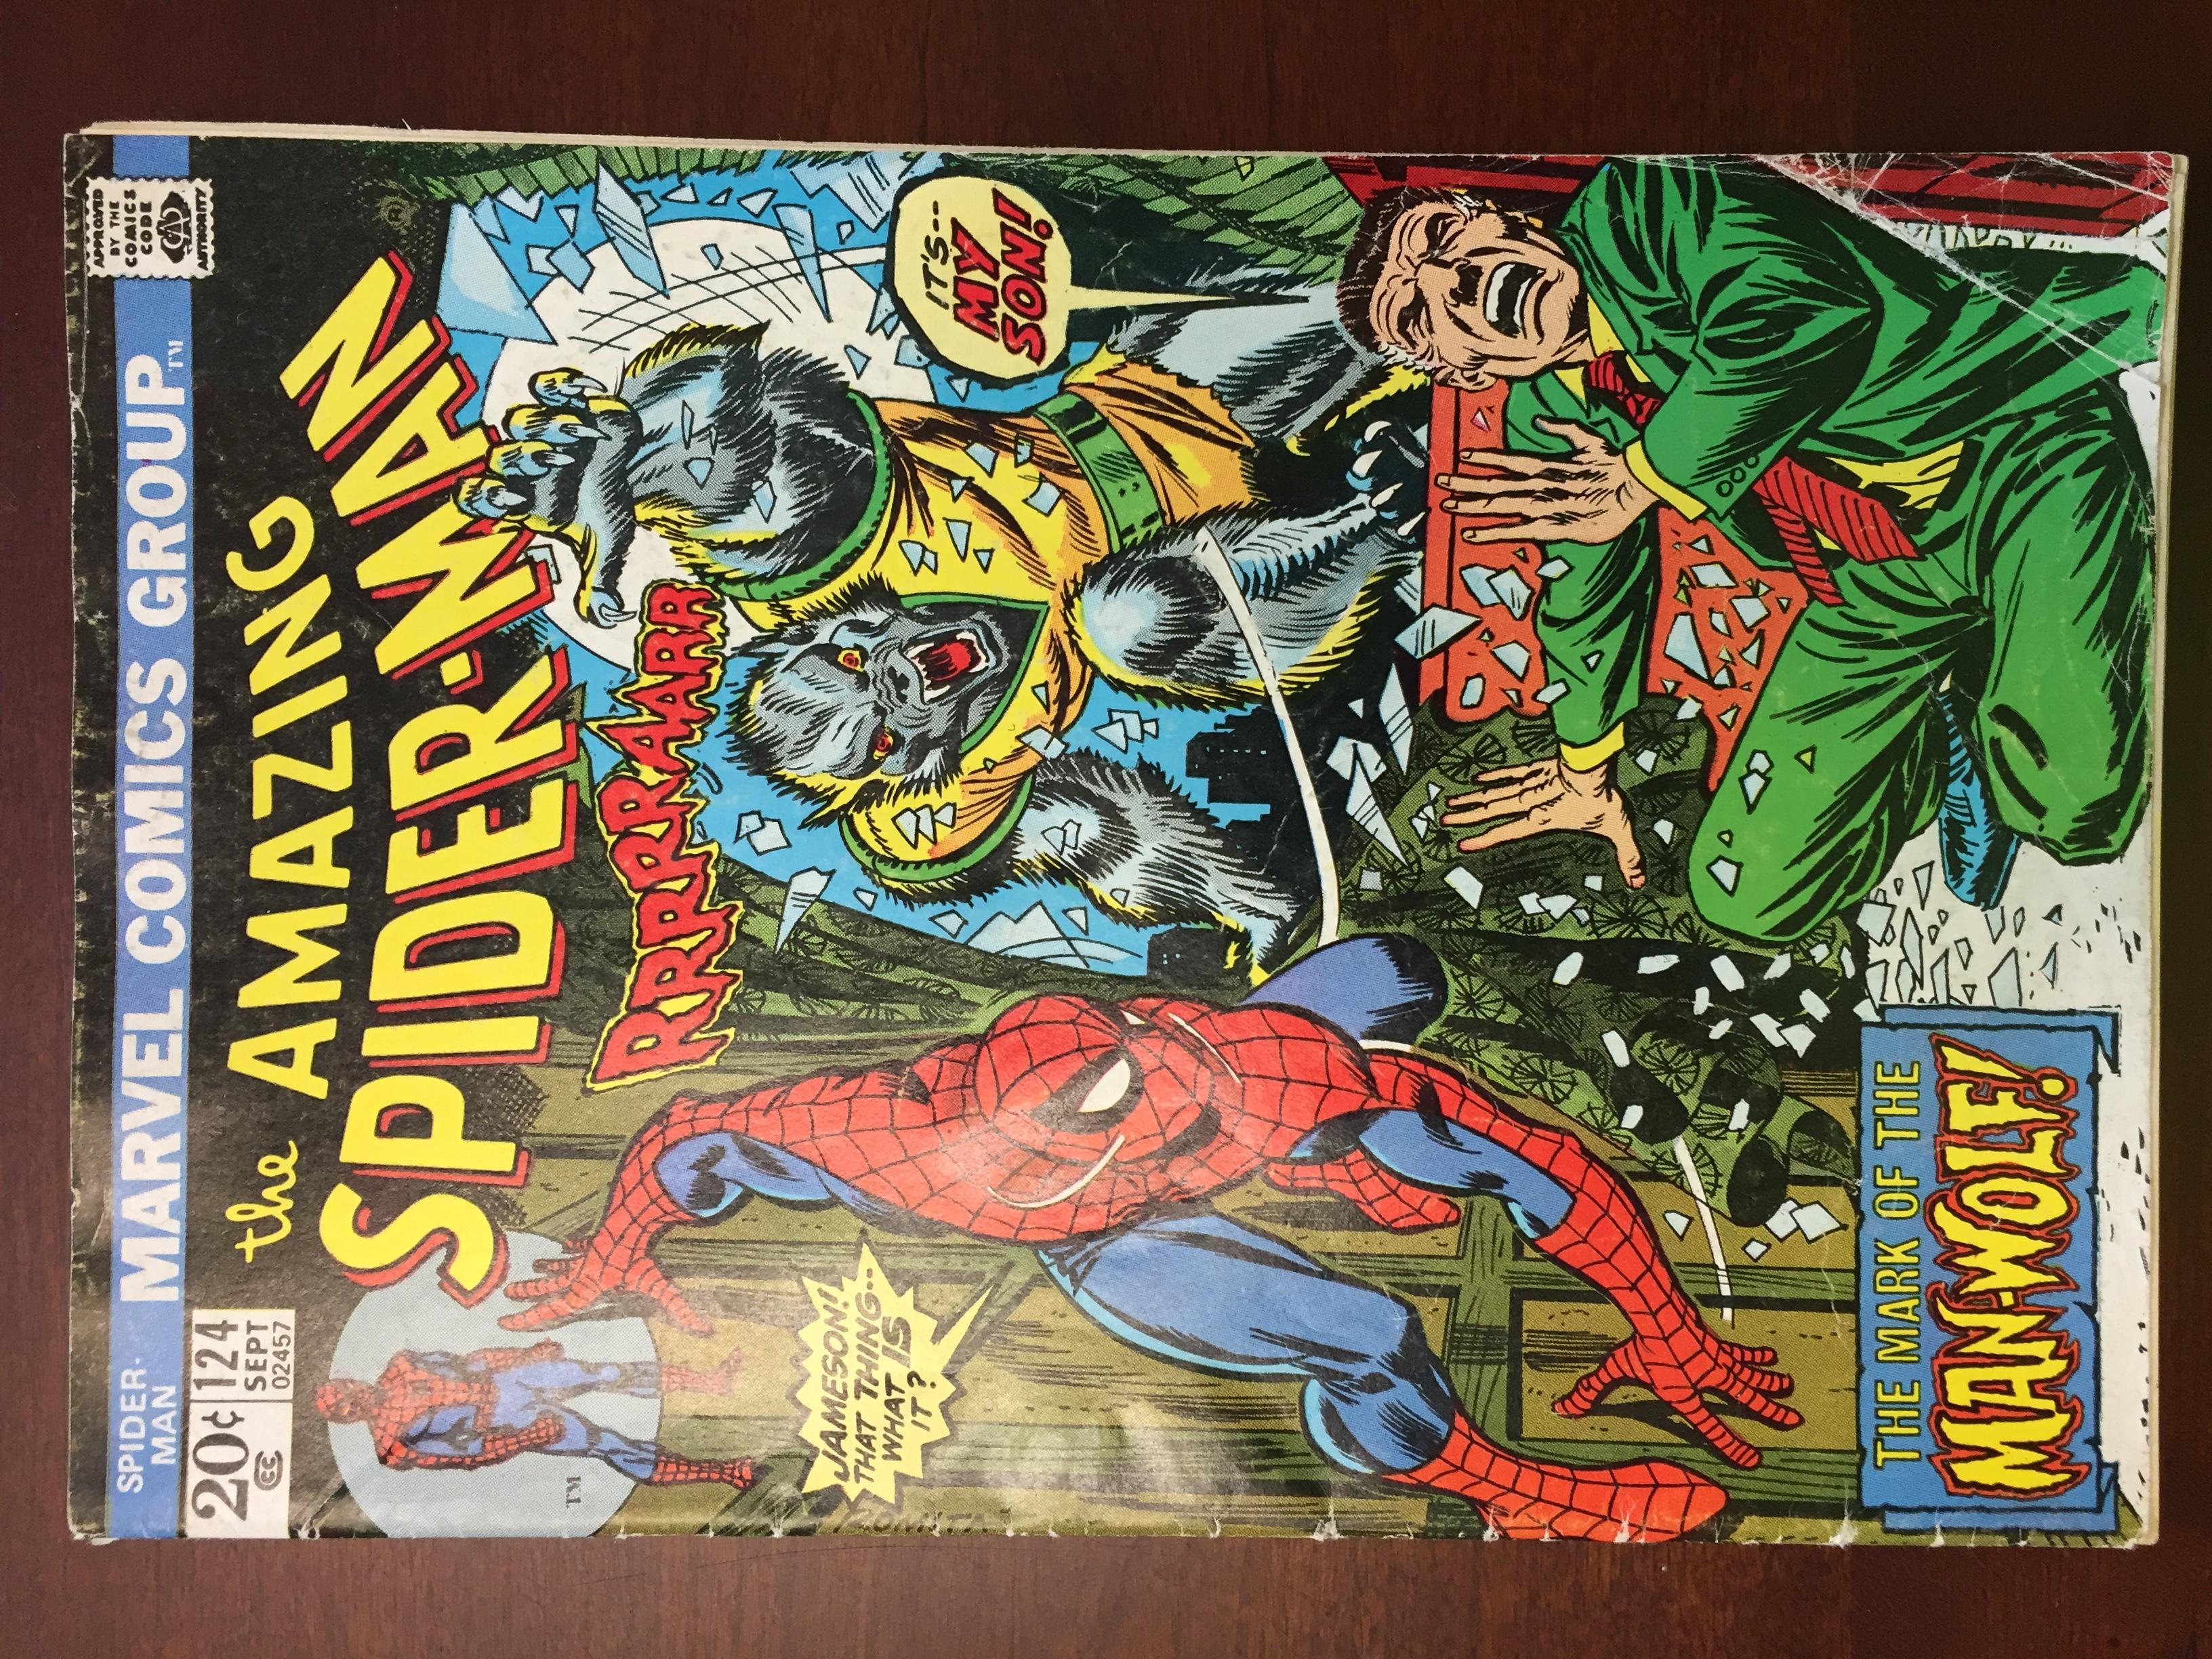 Amazing Spider-man : Investment Grade Key Comics, Where the